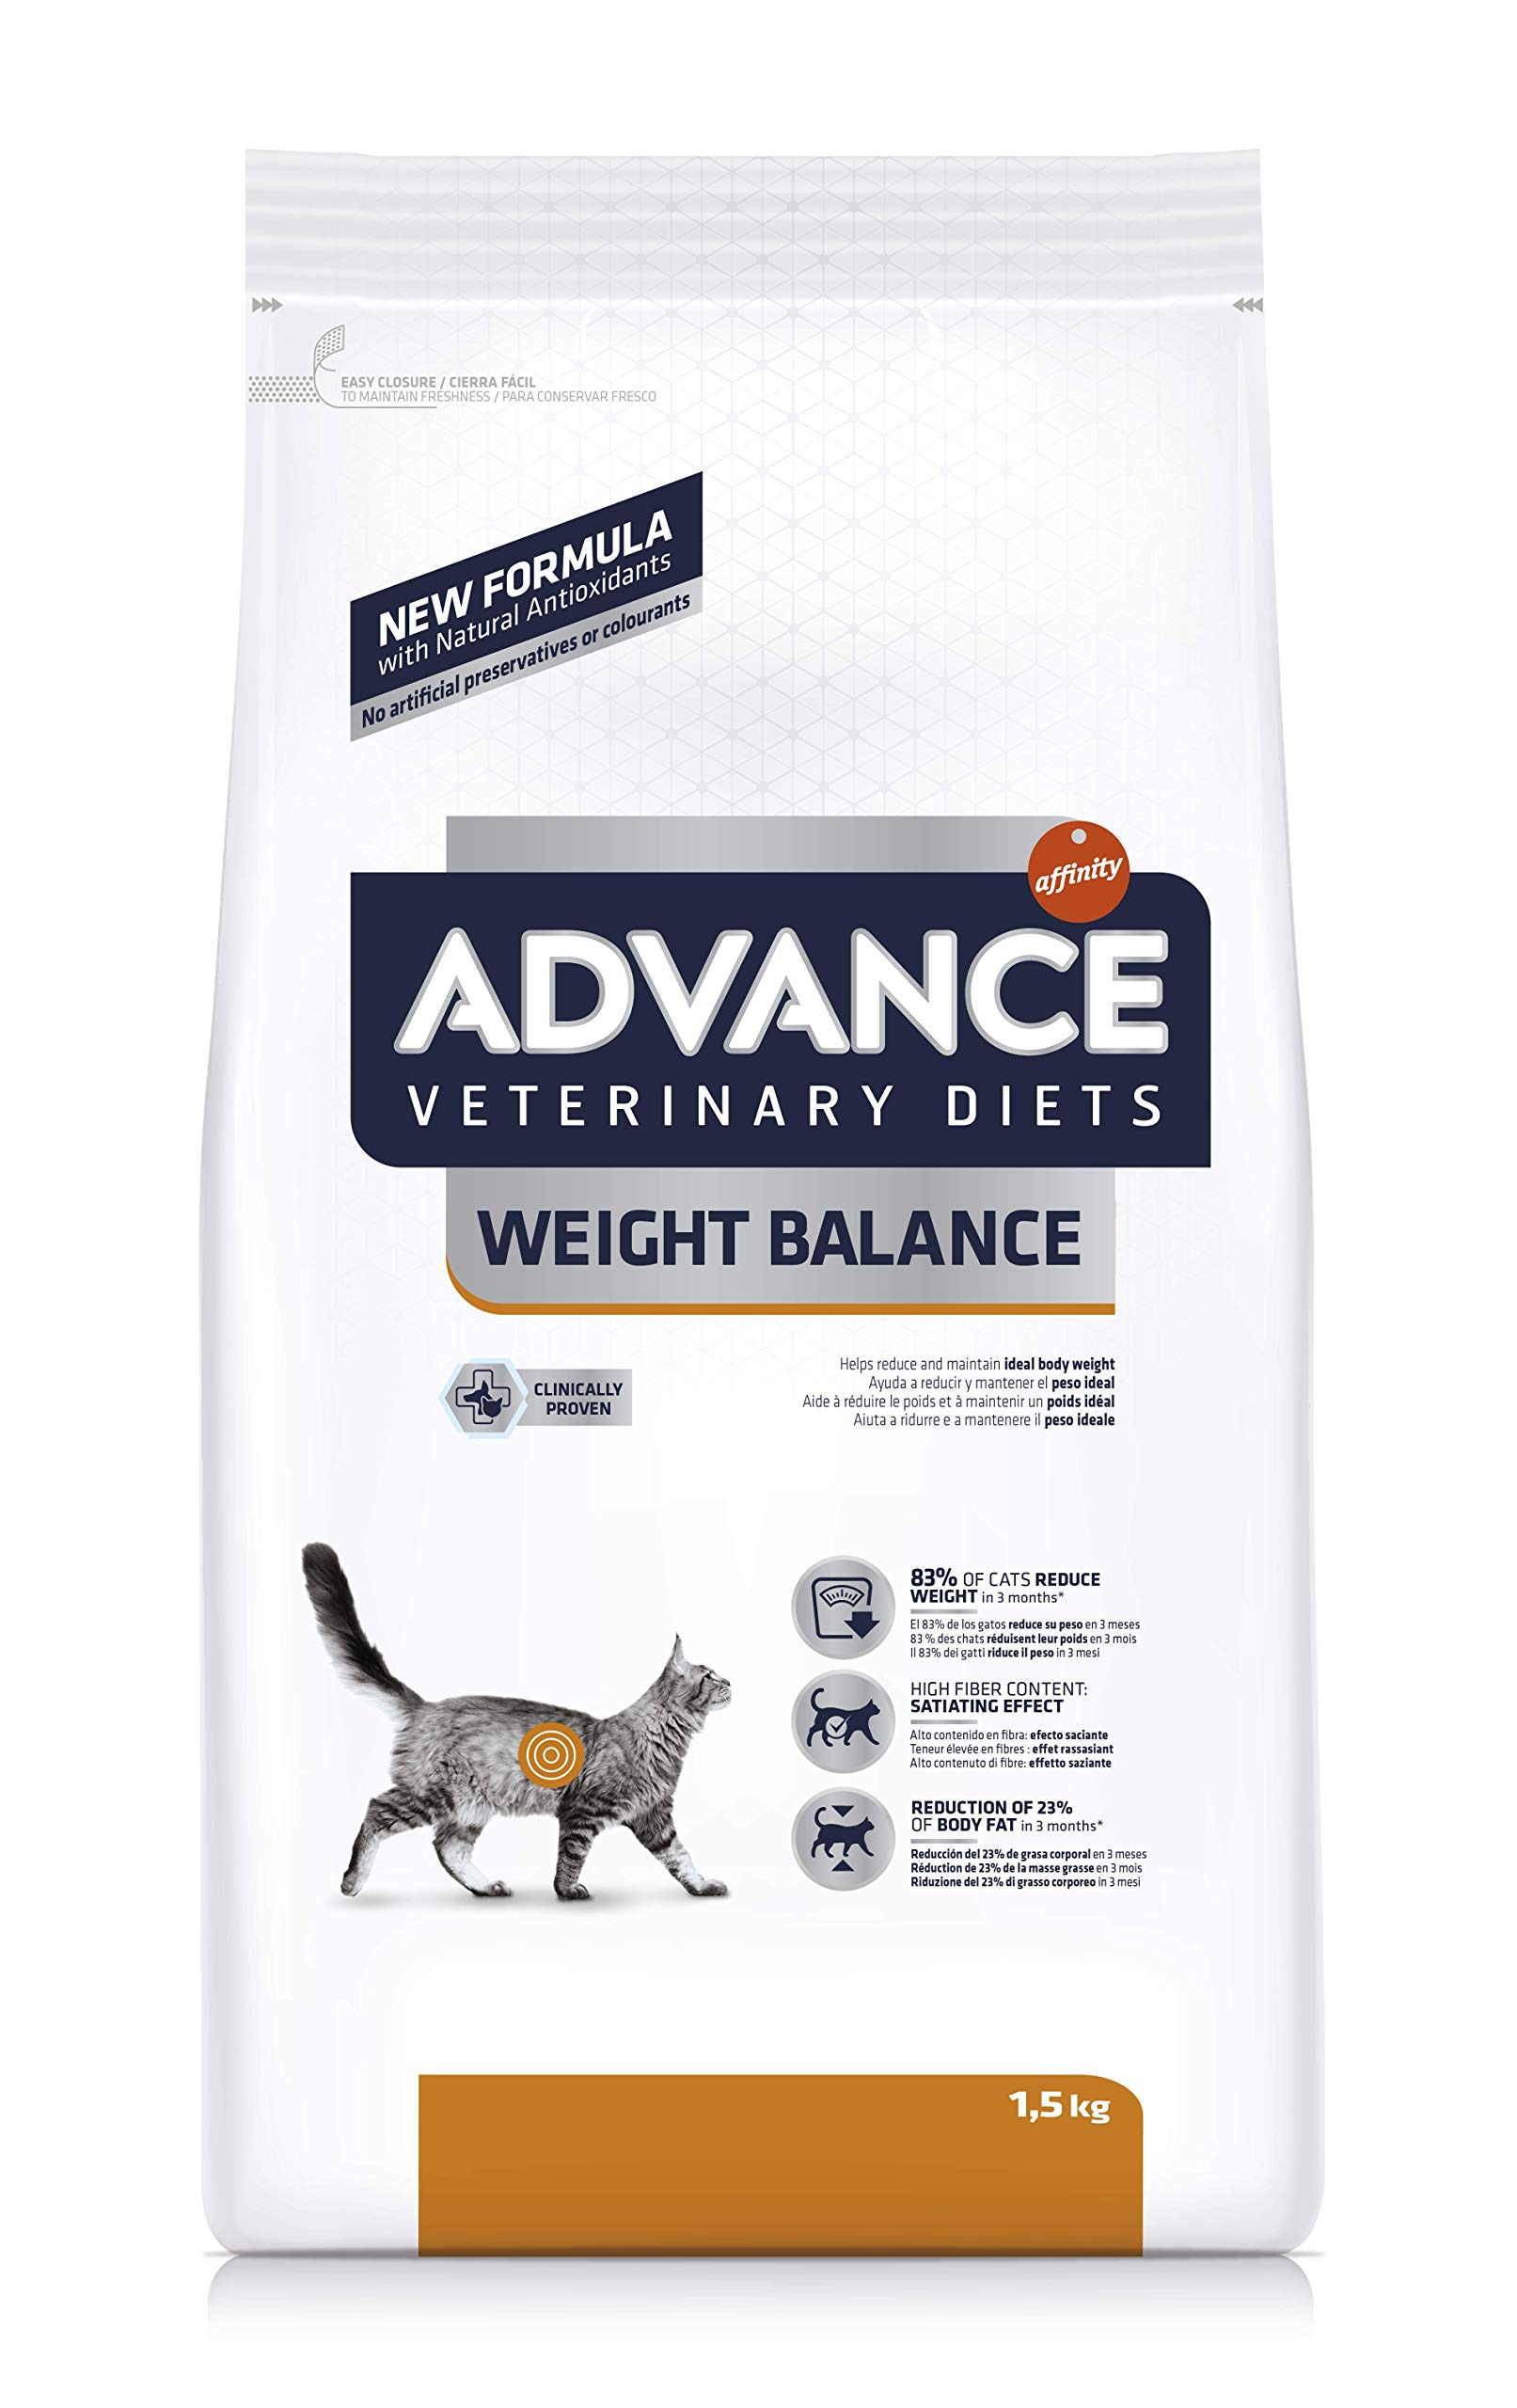 Advance Veterinary Diets Weight Balance – Pienso para gatos con tendencia a la obesidad – 1.5 kg